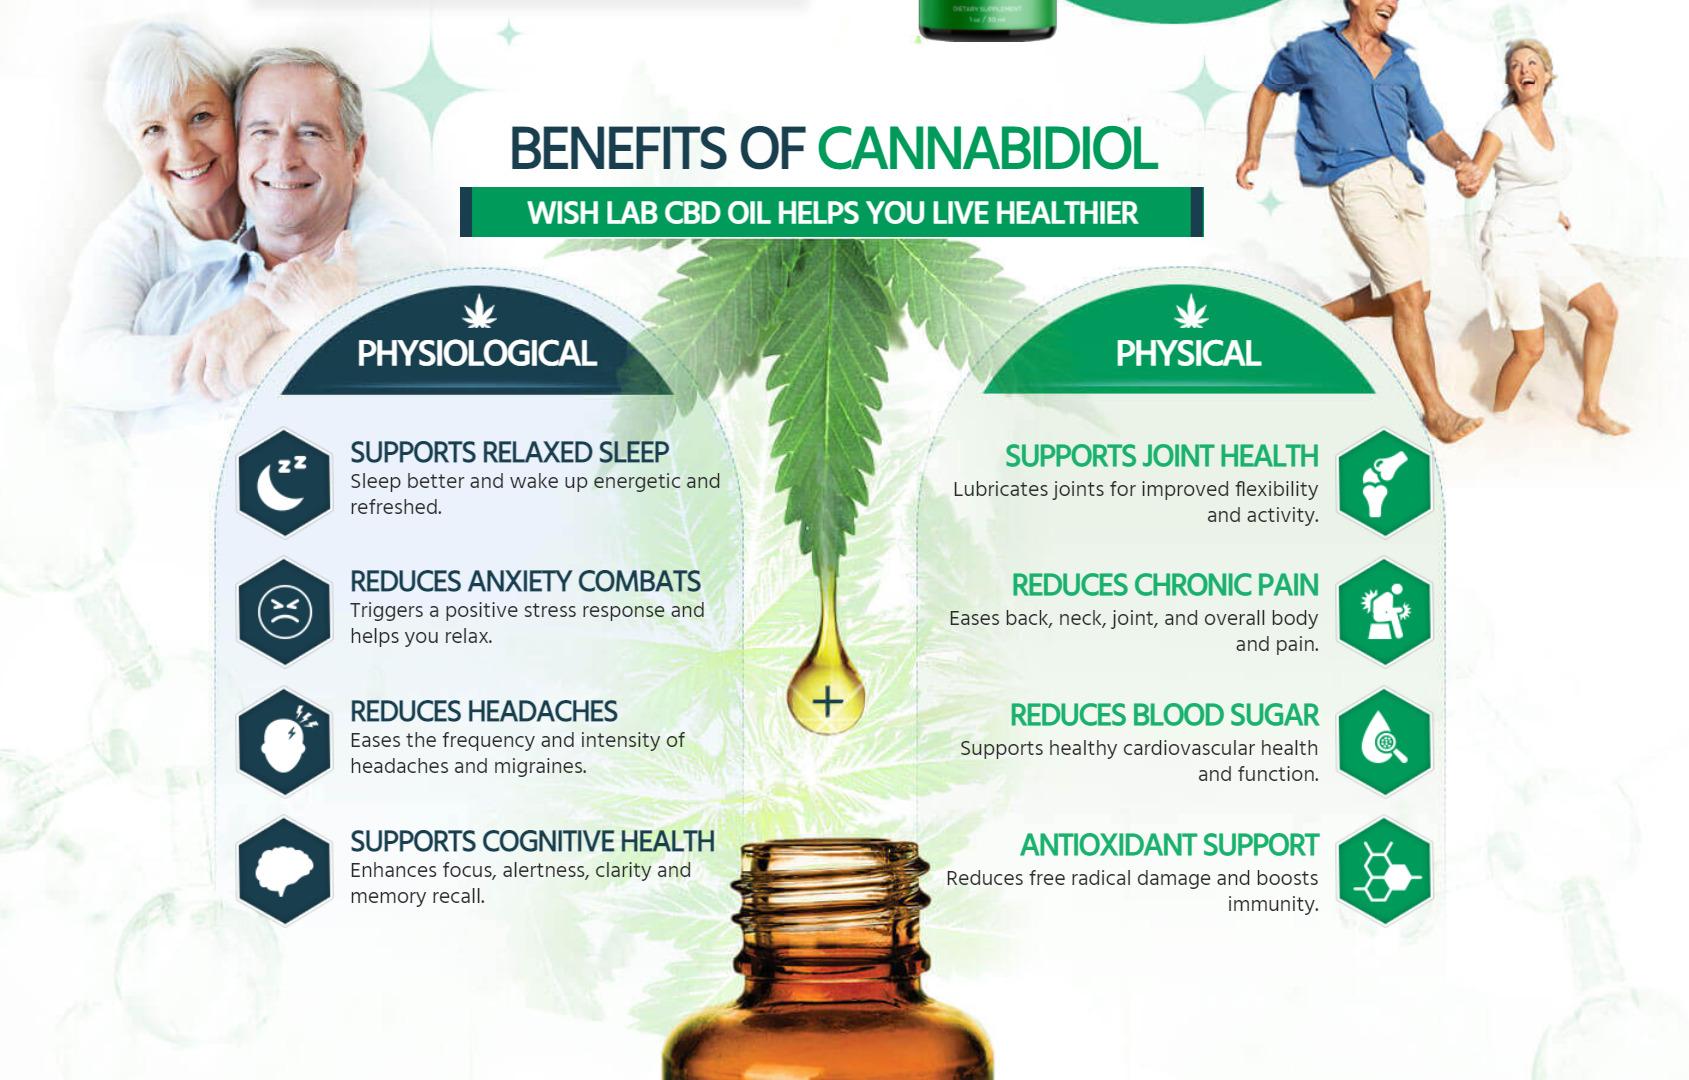 wish lab cbd oil benefits